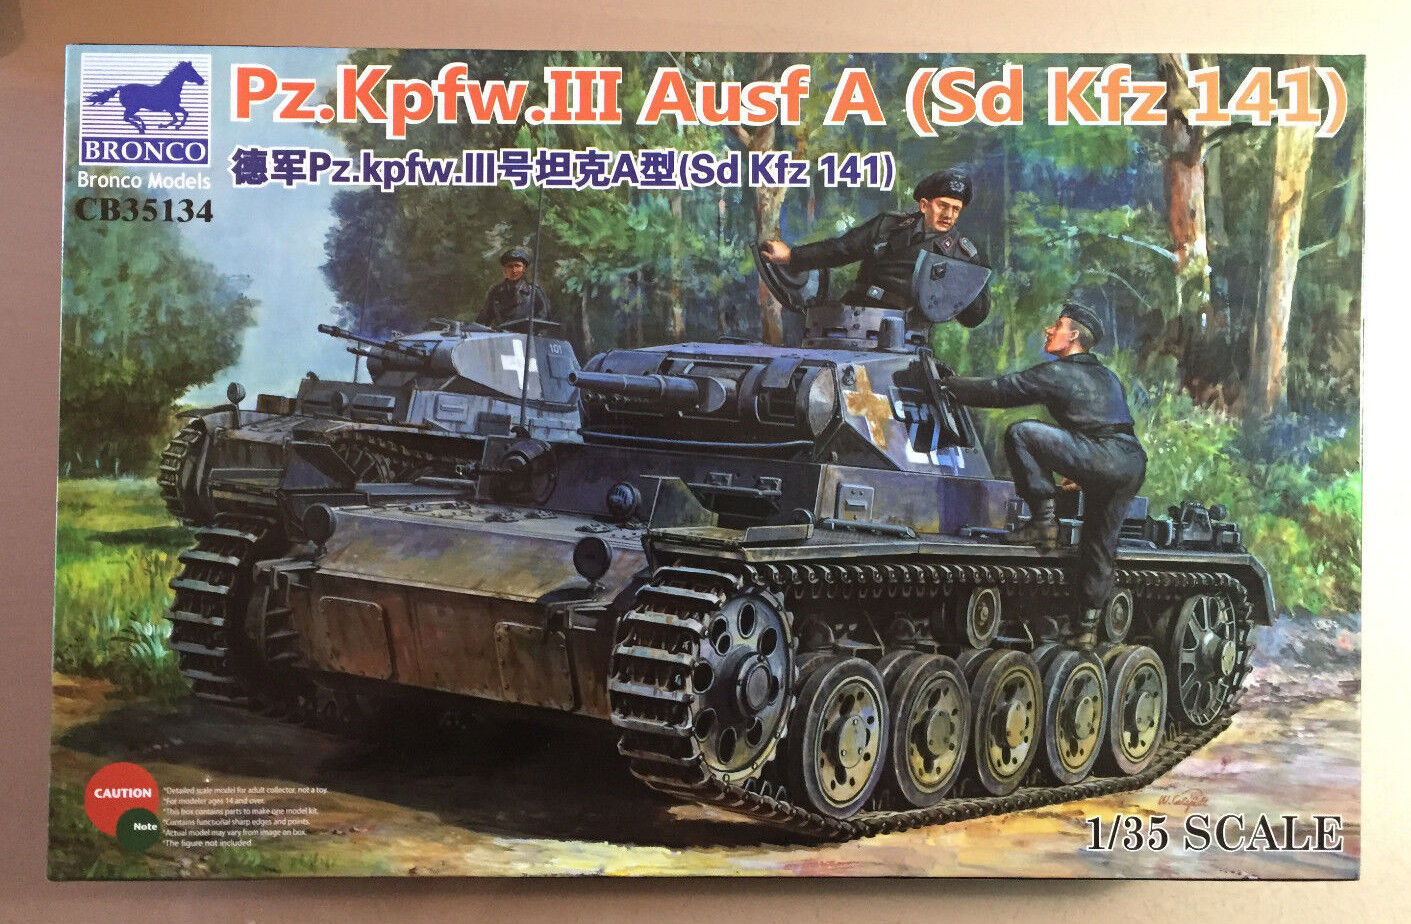 BRONCO MODELS CB35134 - Pz.Kpfw.III Ausf A (Sd Kfz 141) - 1 35 PLASTIC KIT